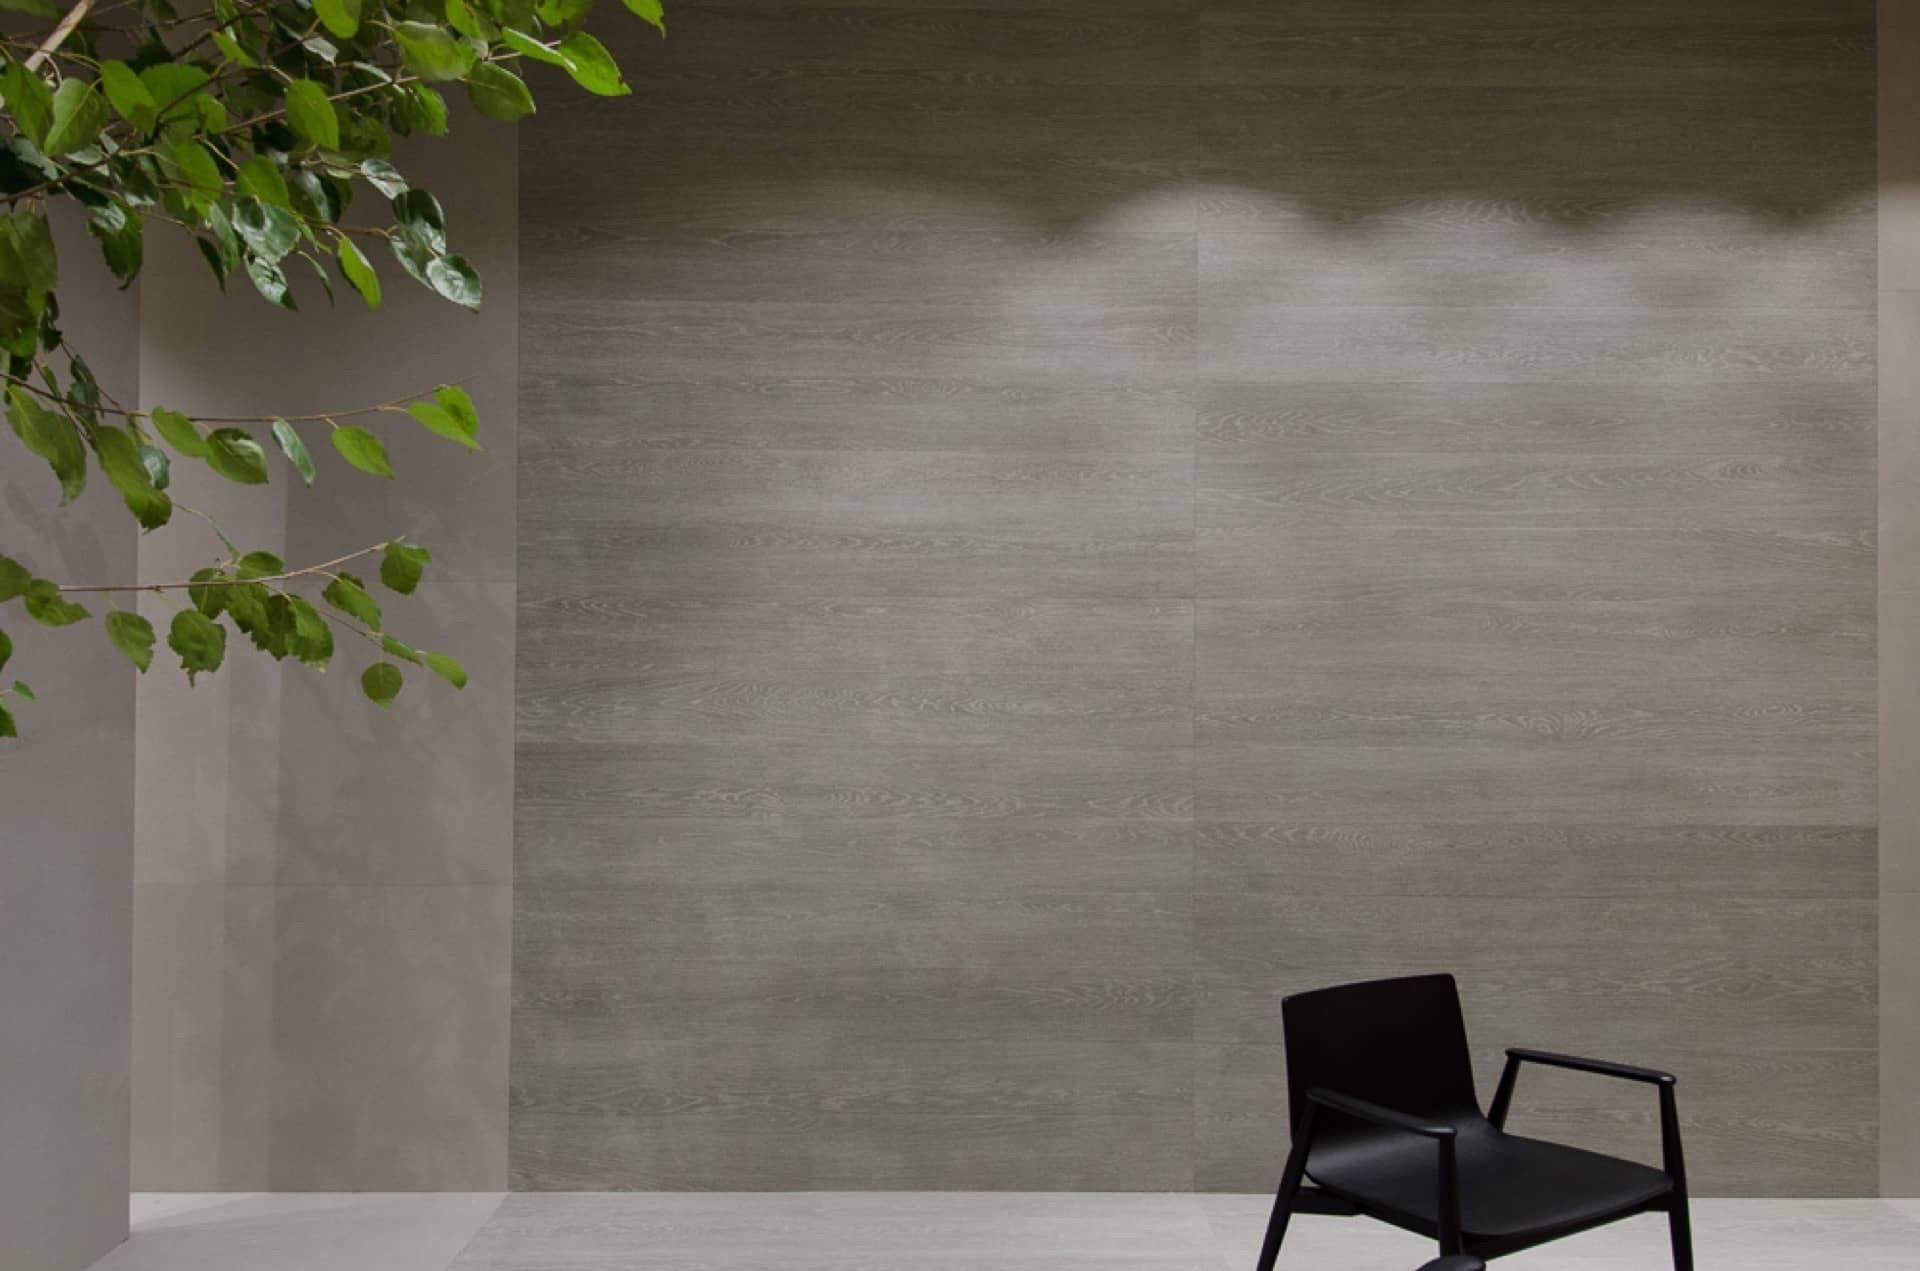 Tr3nd_FashionWood_Smoke_20x180_Concrete_grey_80x120_4